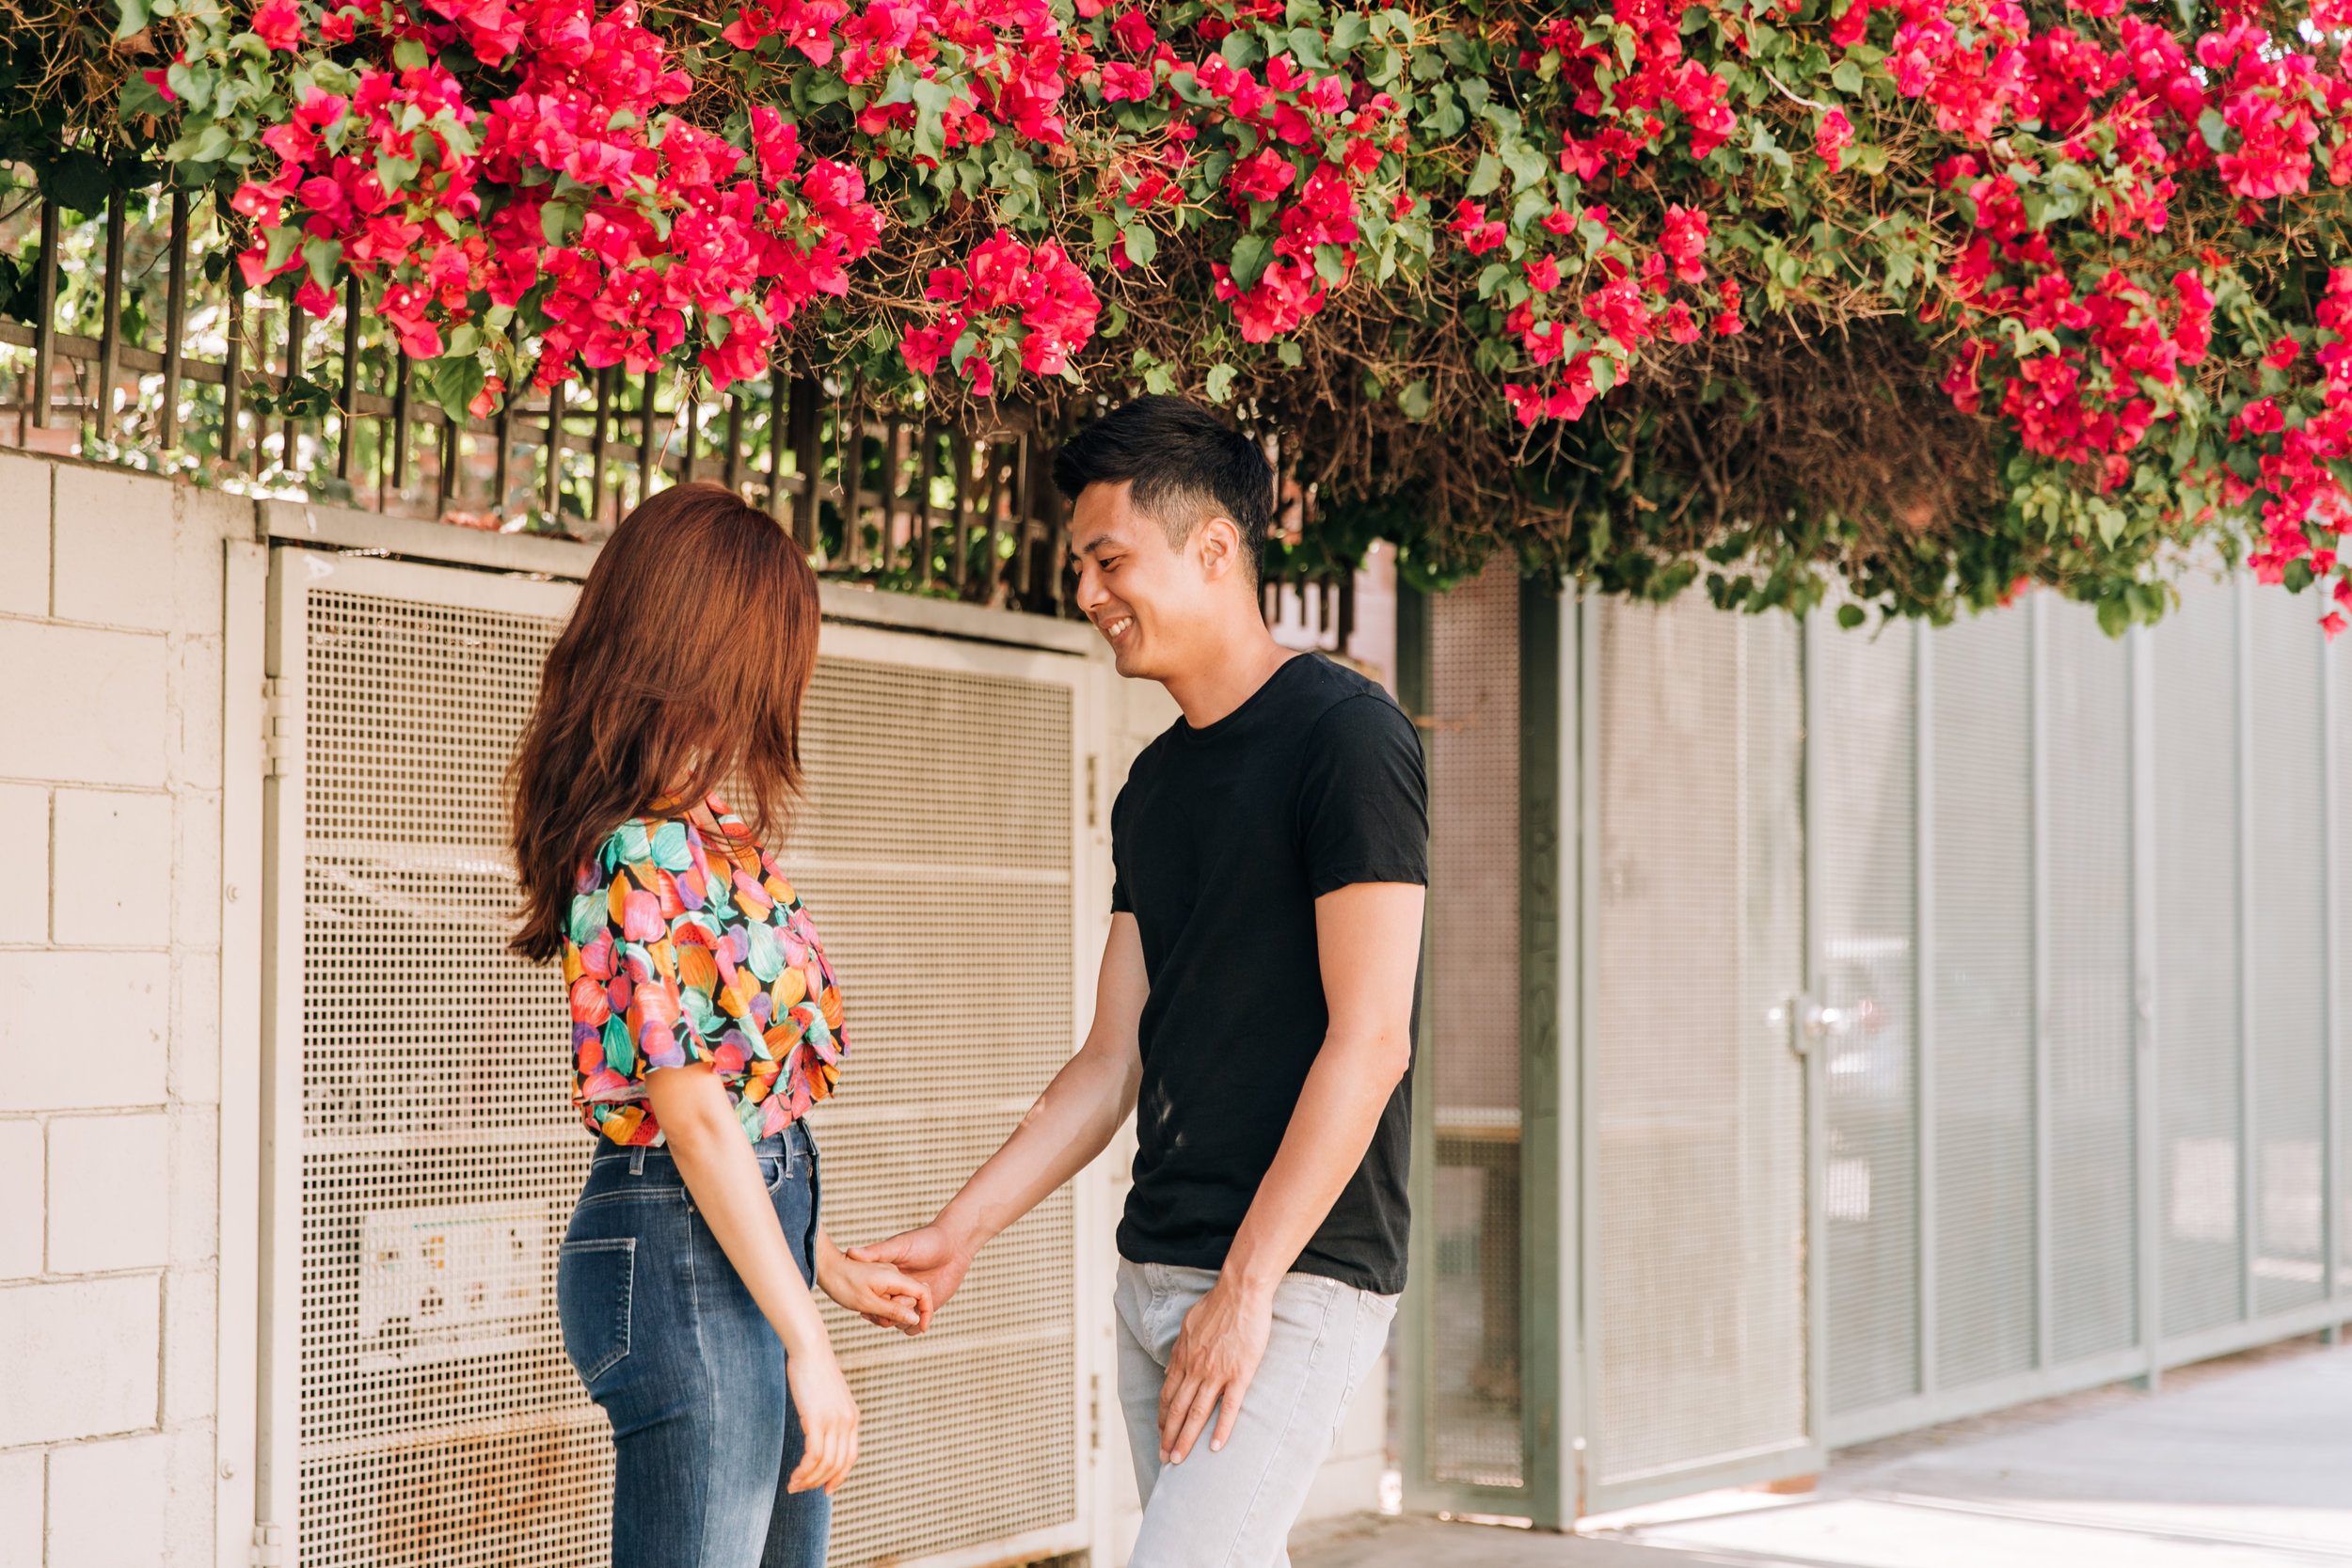 DTLA engagement photographer, SoCal engagement photographer, Southern California engagement photographer, Los Angeles engagement photographer, DTLA Arts district engagement shoot, DTLA engagement